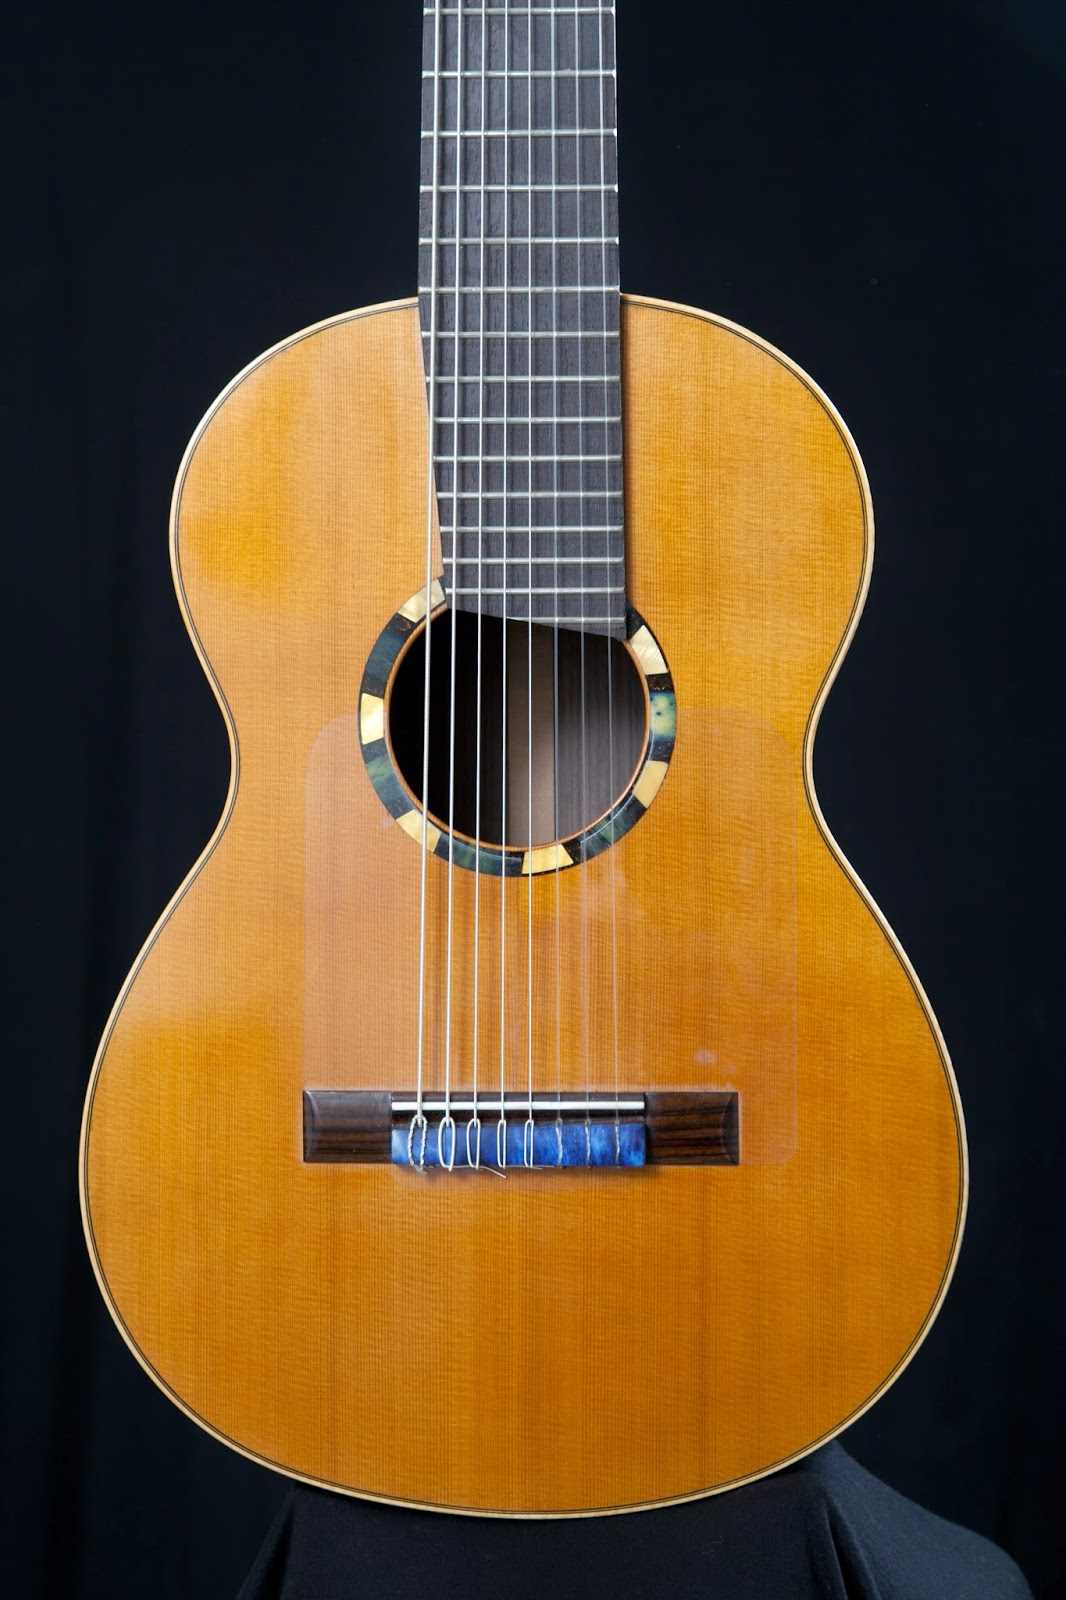 guitarras custom constru das por rodolfo cucculelli. Black Bedroom Furniture Sets. Home Design Ideas